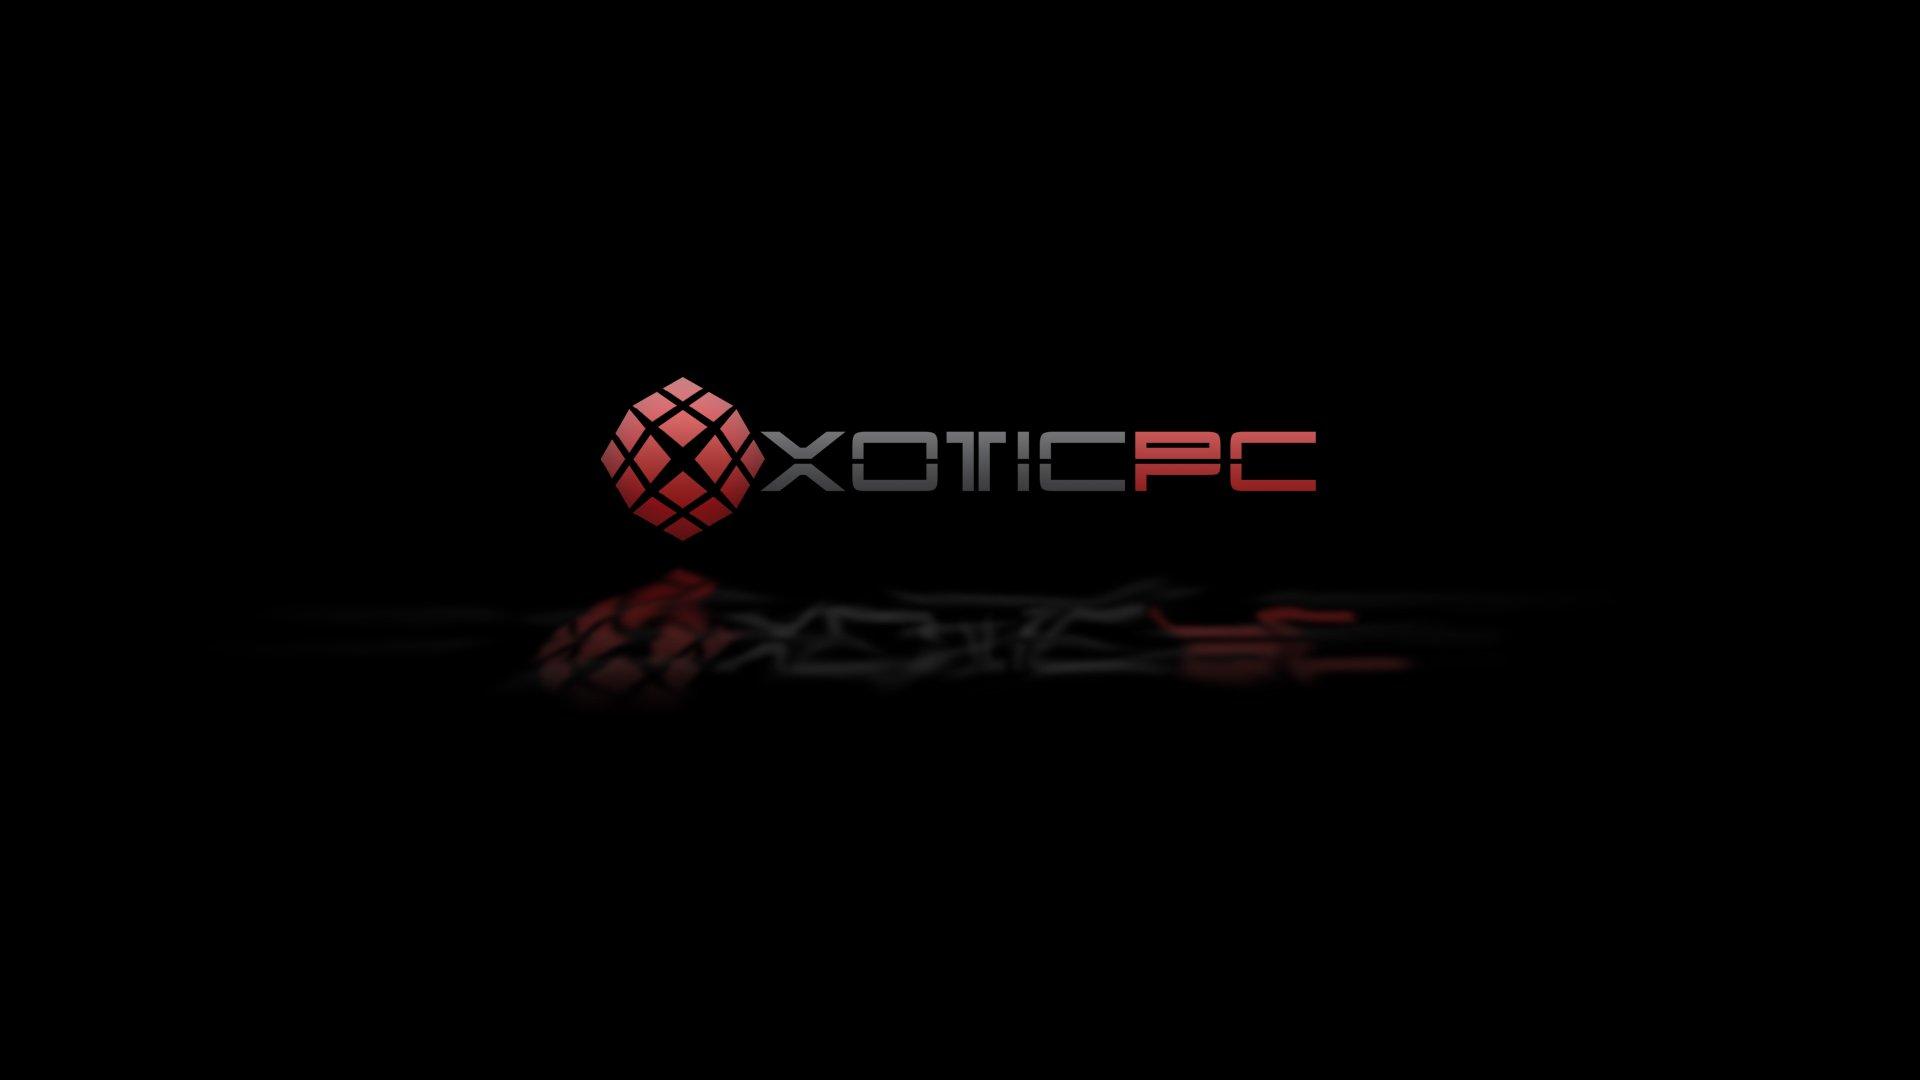 XOTIC PC Custom Wallpapers Downloads 1920x1080